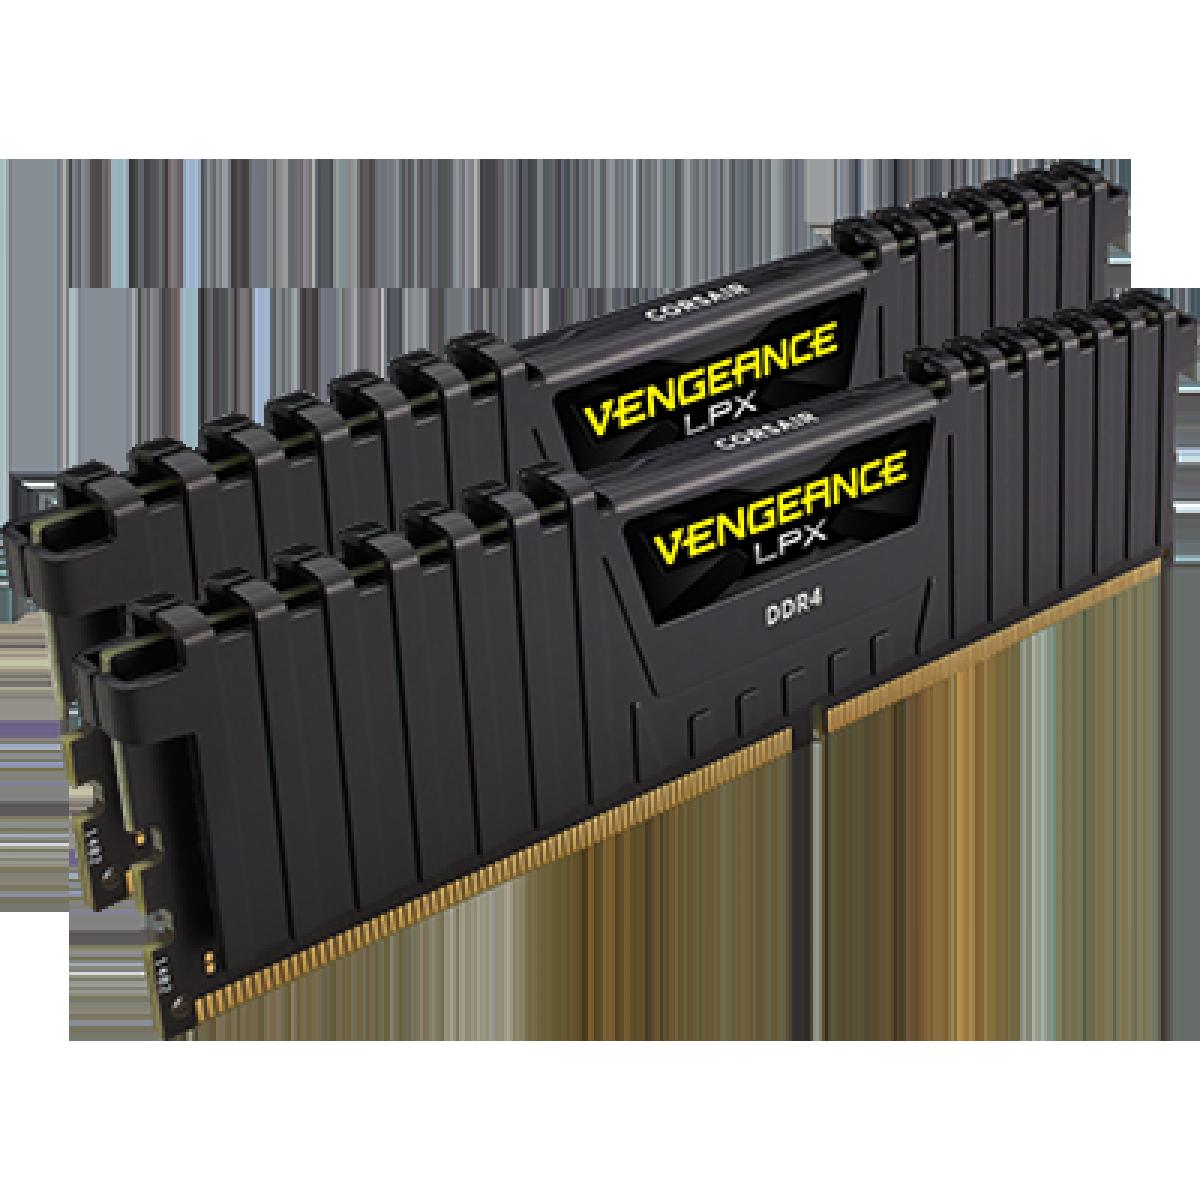 Memória DDR4 Corsair Vengeance LPX, 16GB (2x8GB) 3600MHz, CMK16GX4M2D3600C18